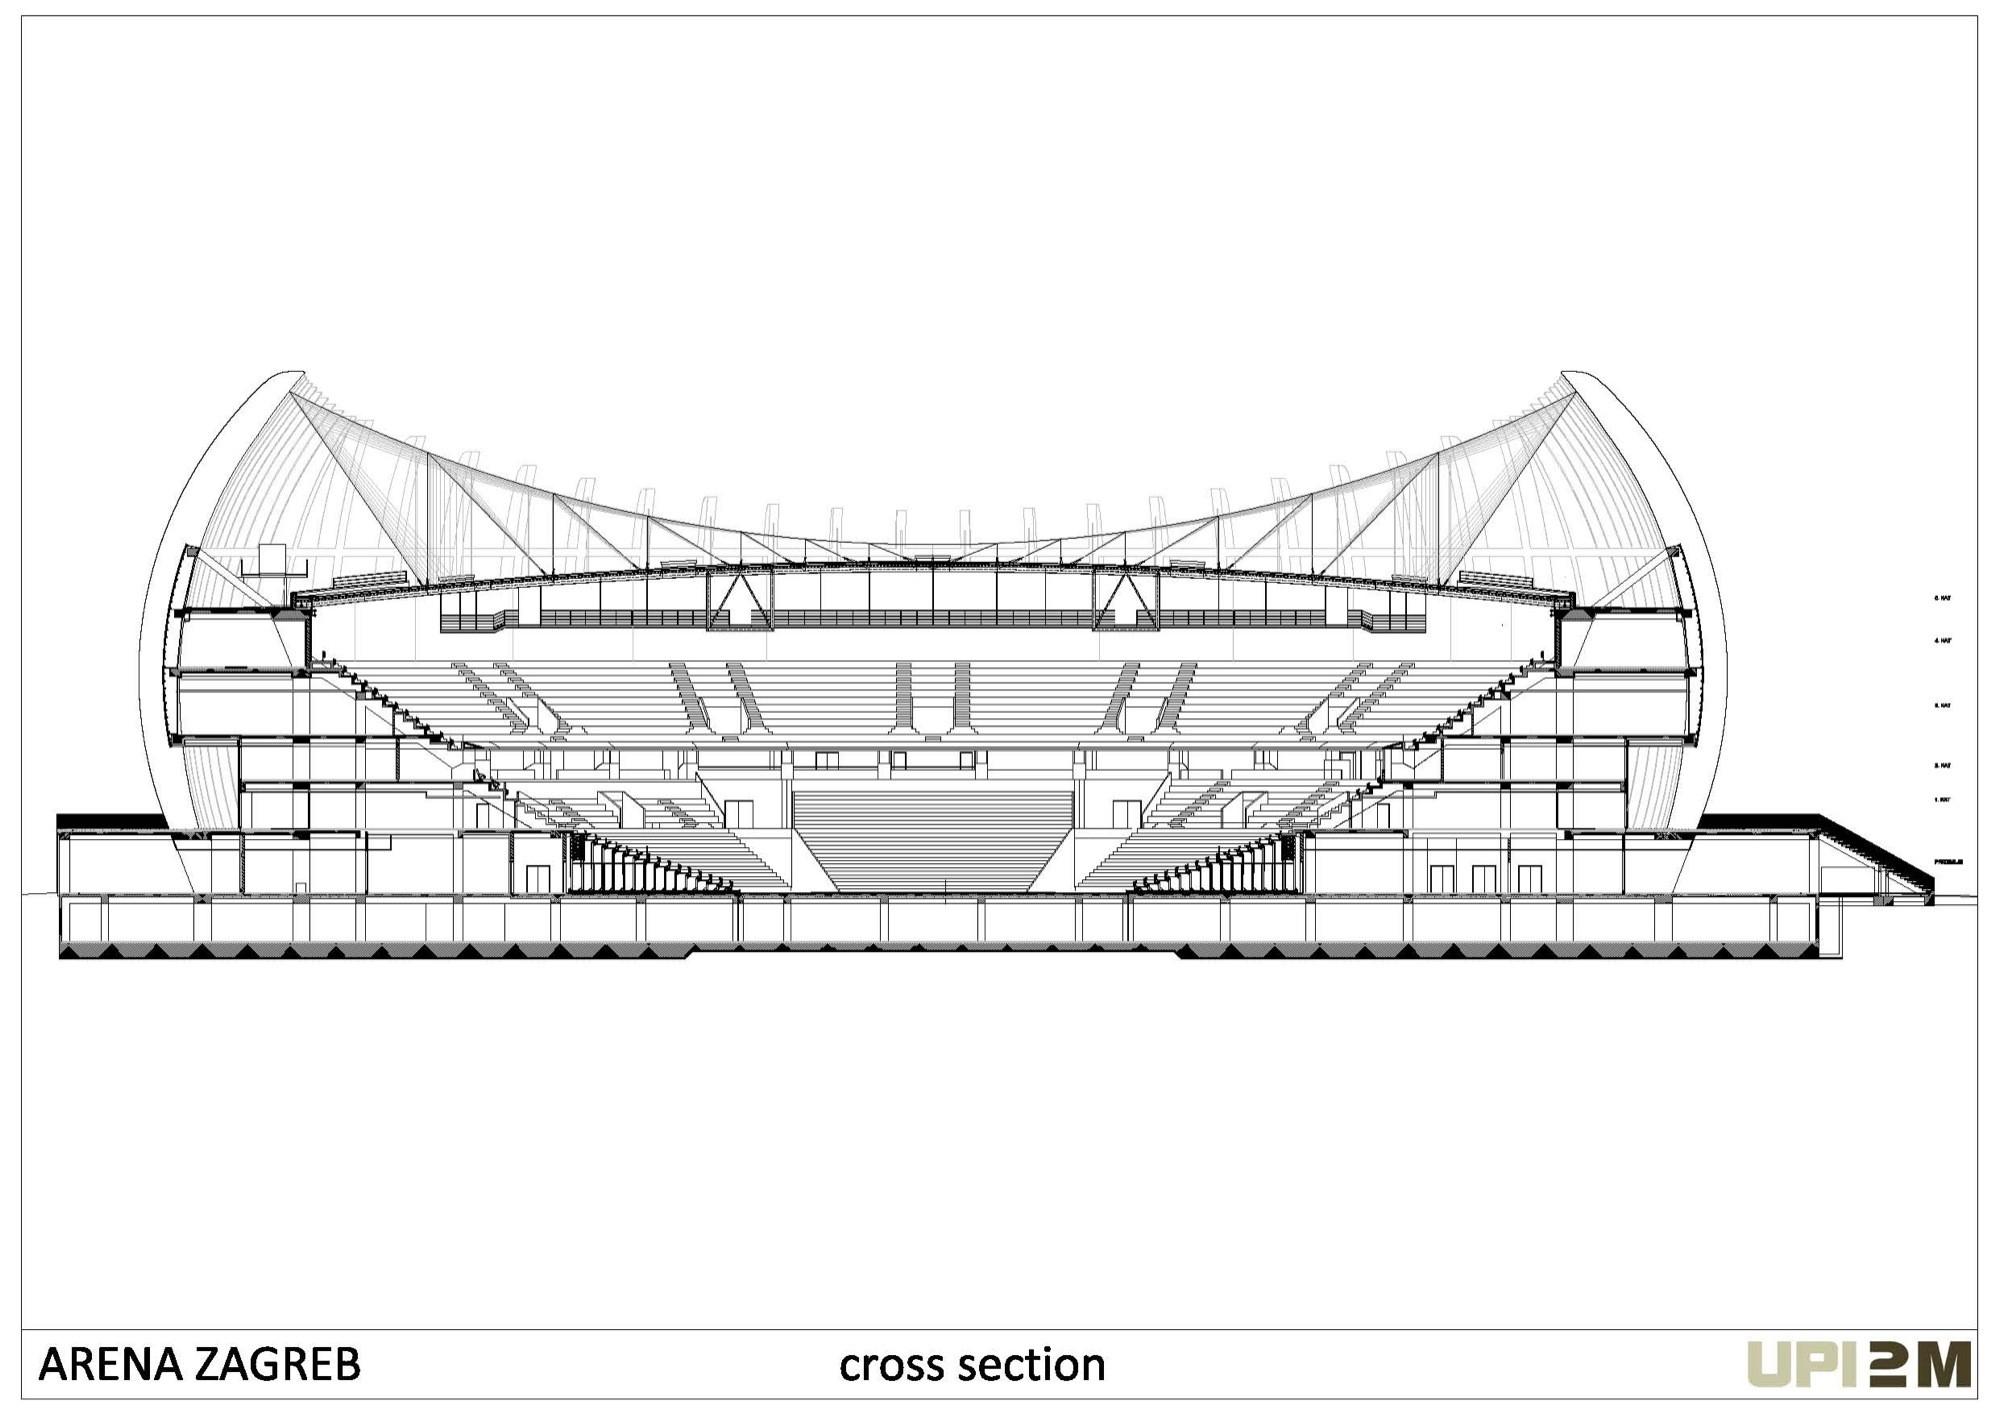 Basketball Arena Floor Plan Gallery Of Arena Zagreb Upi 2m 41